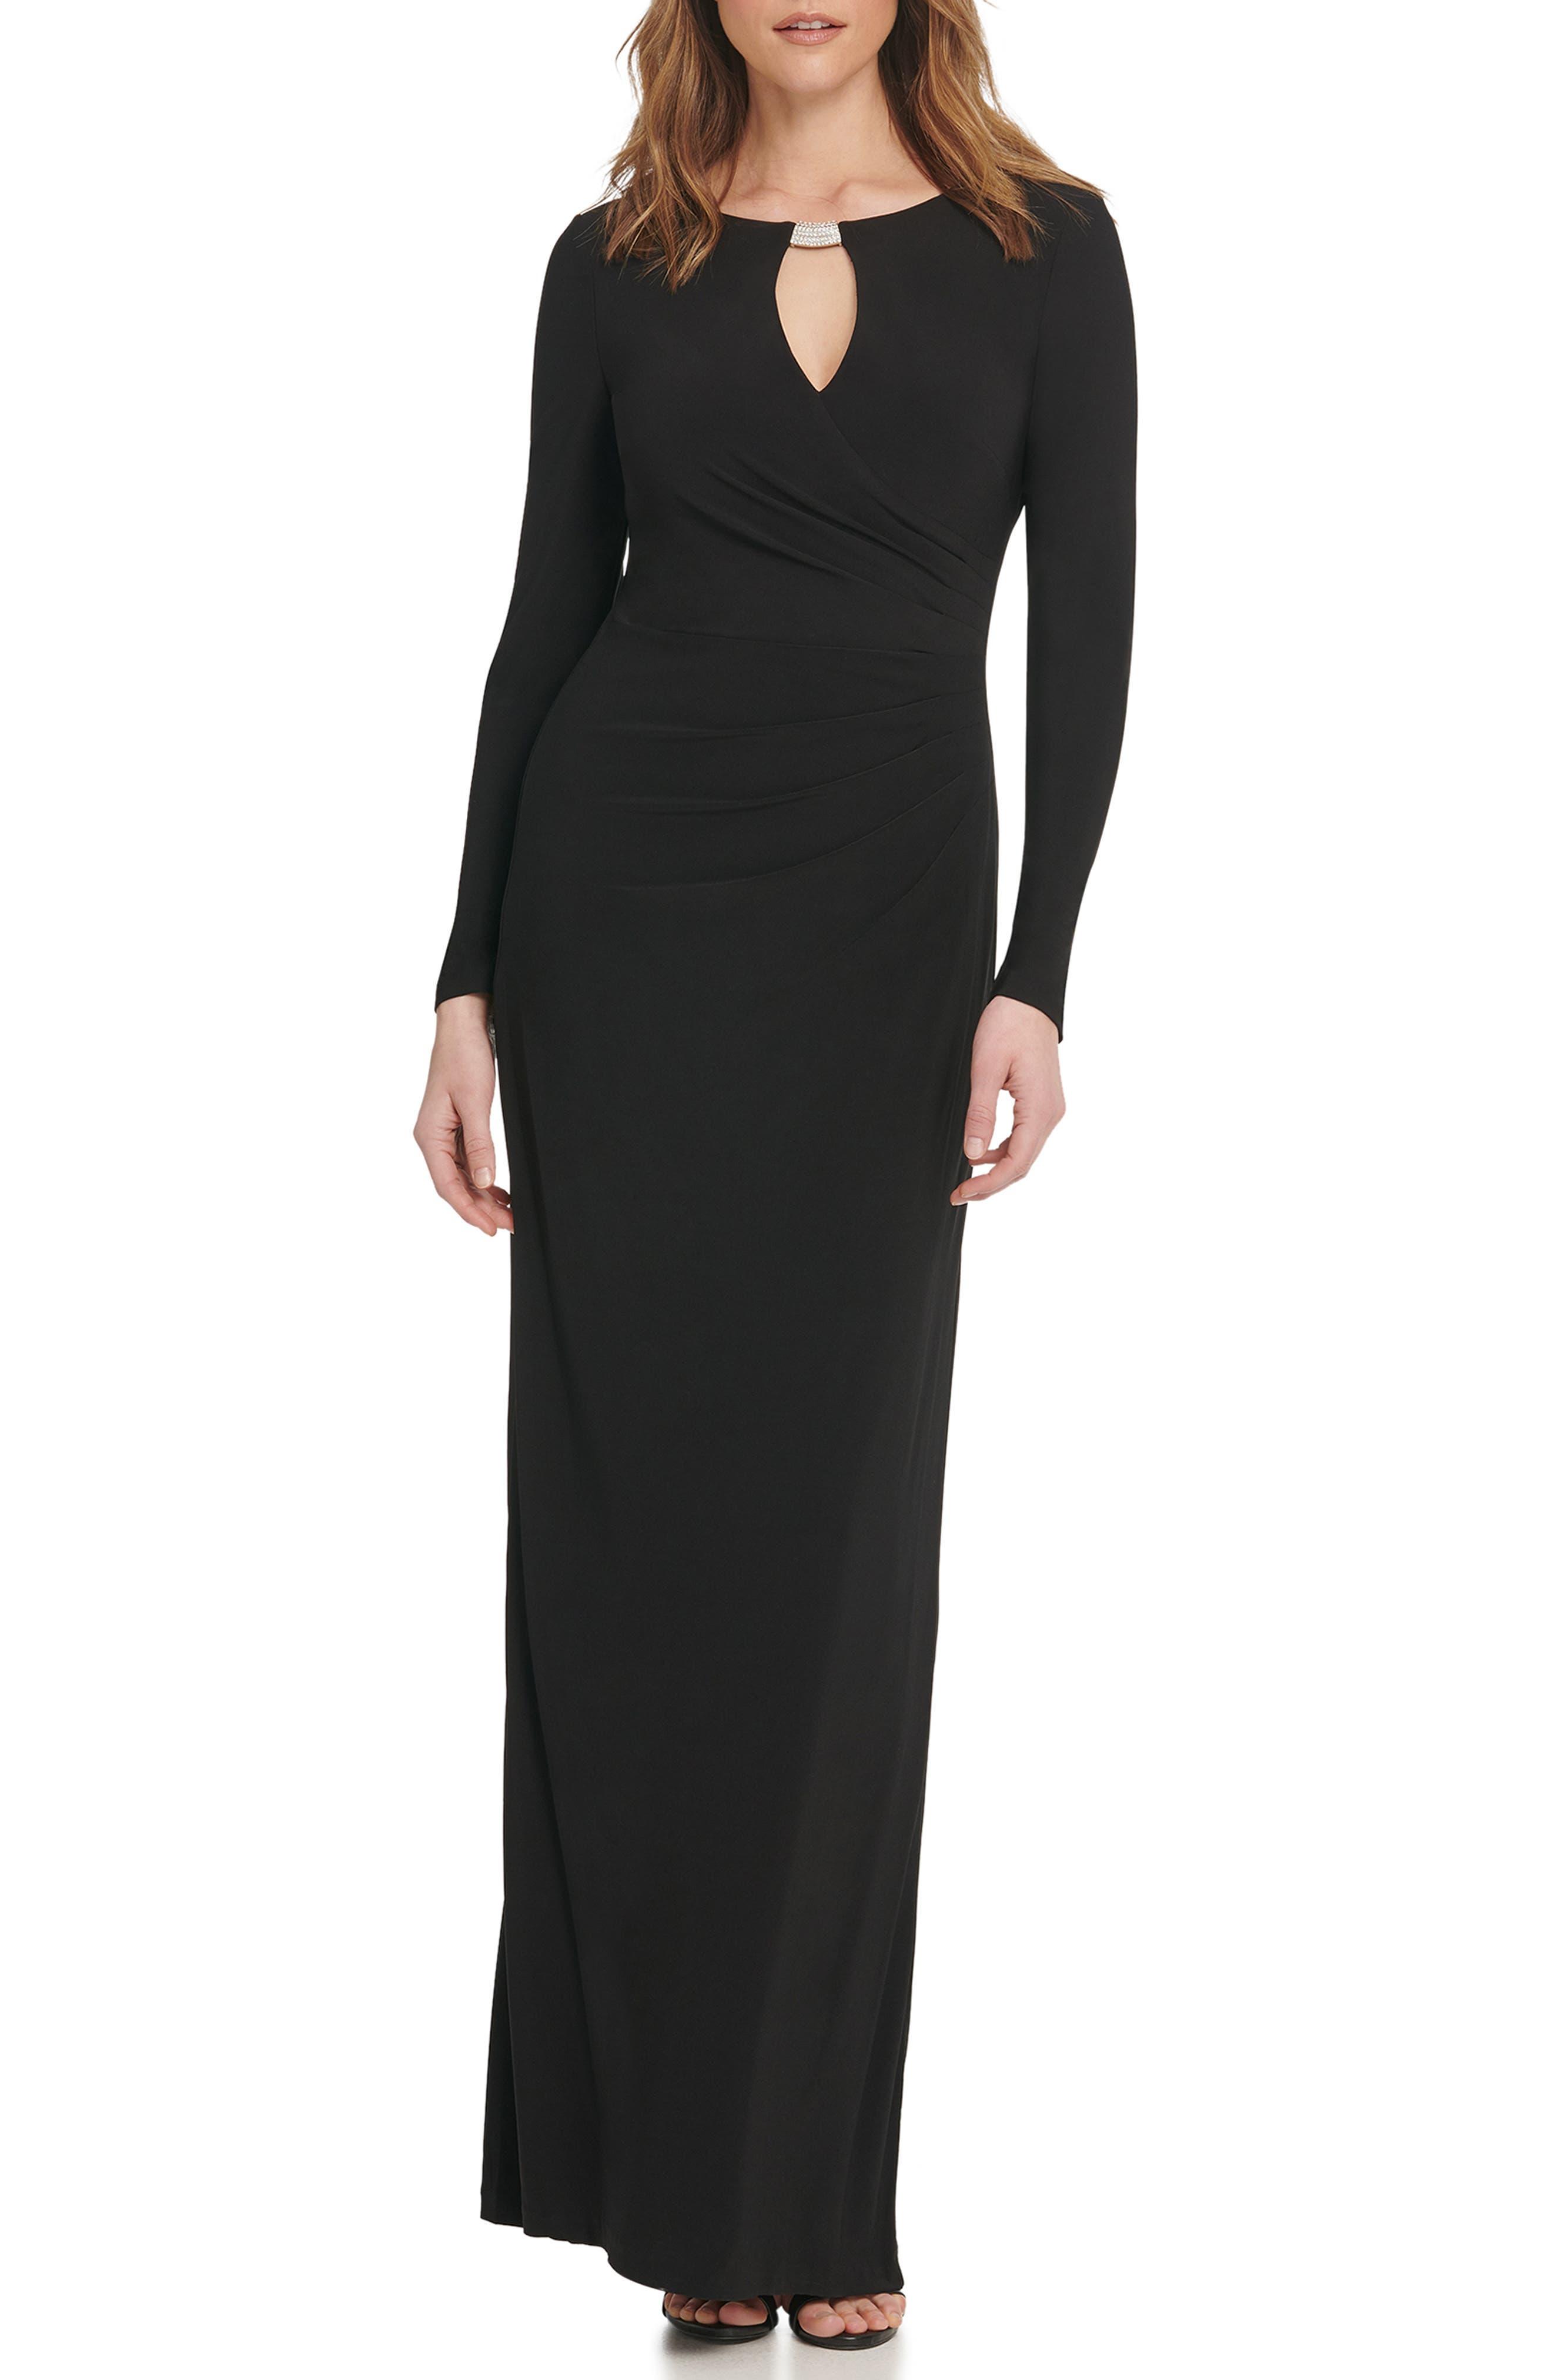 70s Prom, Formal, Evening, Party Dresses Womens Vince Camuto Embellished Long Sleeve Column Gown $158.00 AT vintagedancer.com